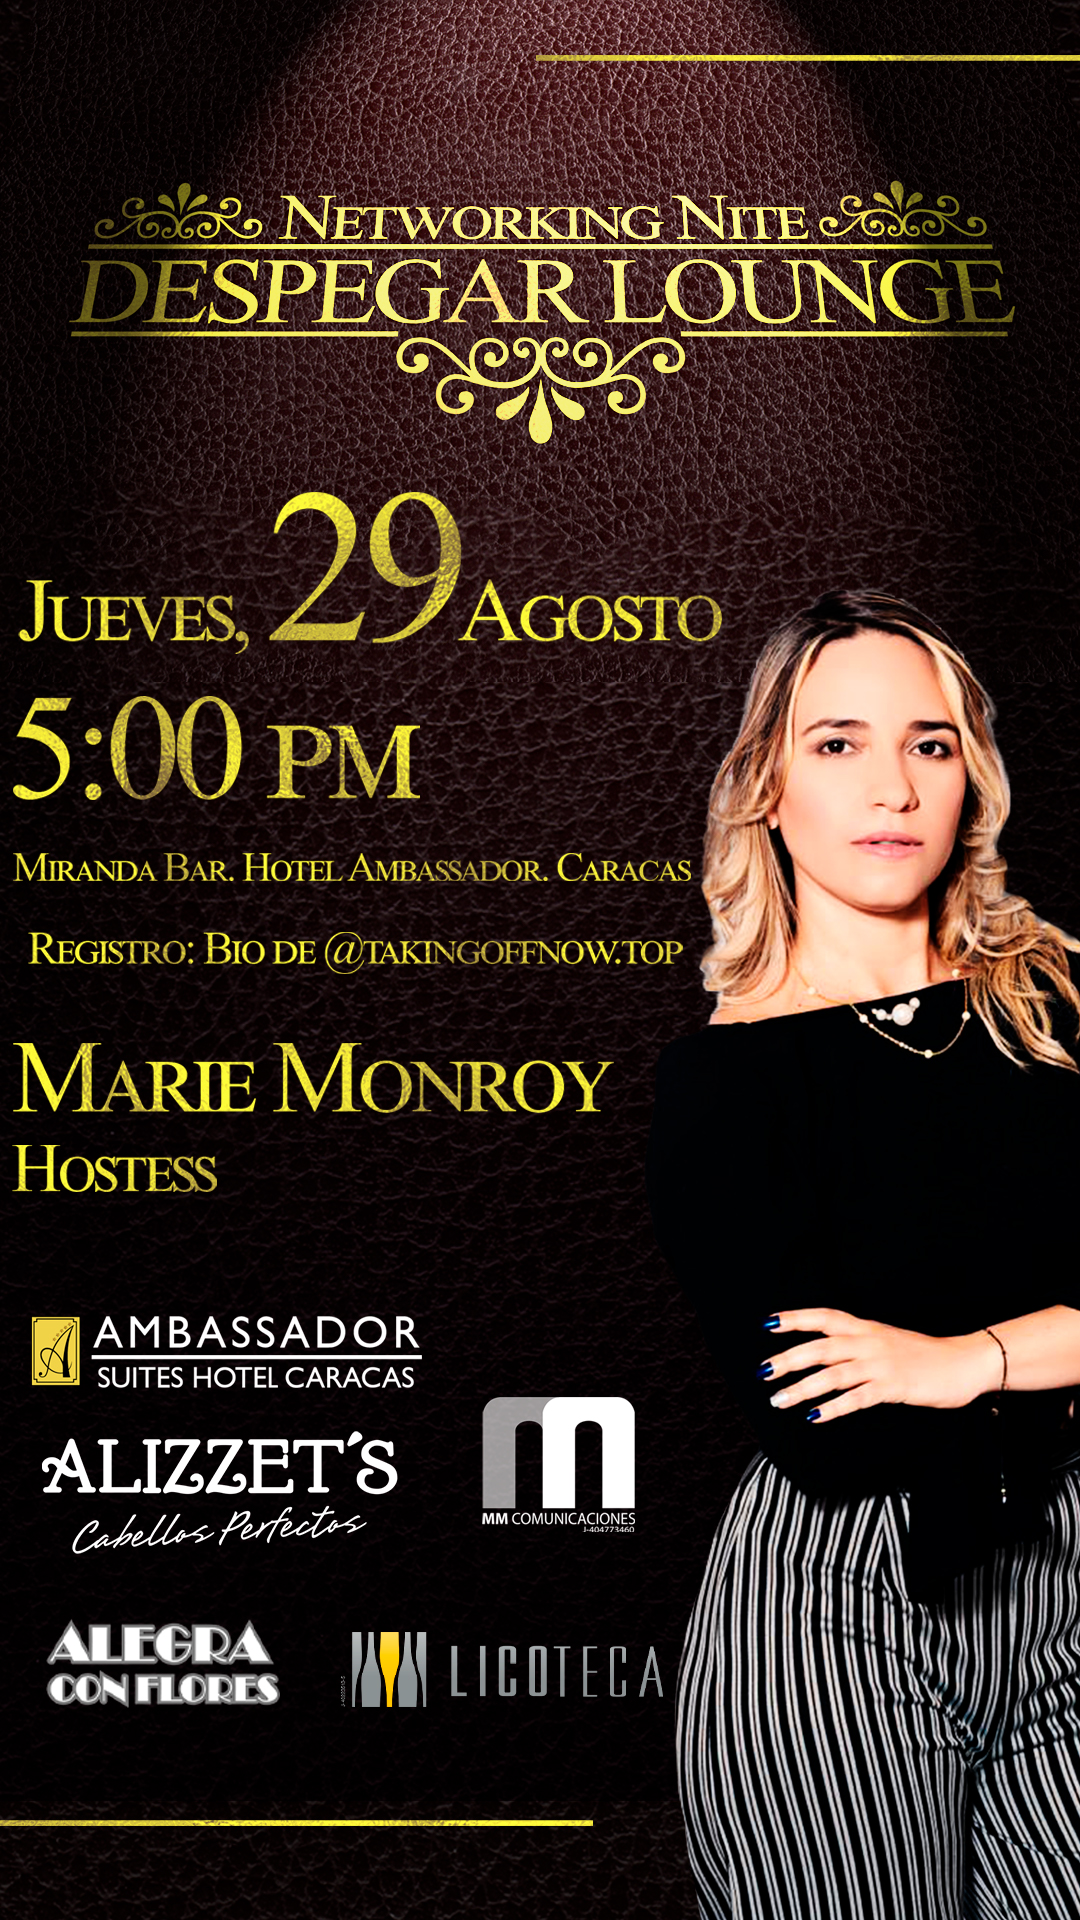 Despegar Lounge Networking Nite Marie Monroy MM comunica